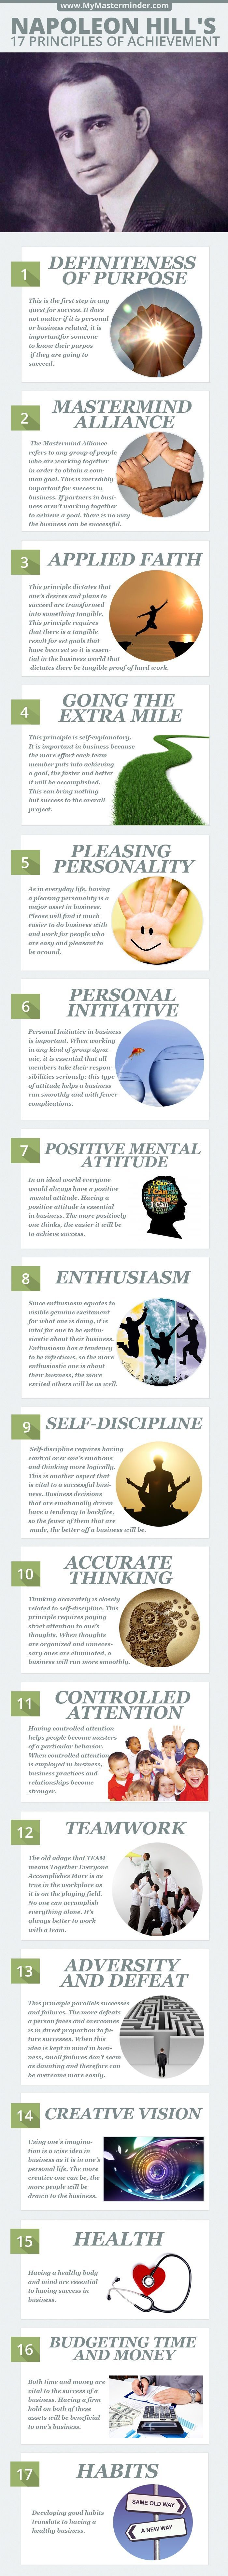 Napoleon Hill's 17 Principles of Personal Achievement Personal Developmental Quotes #Quote